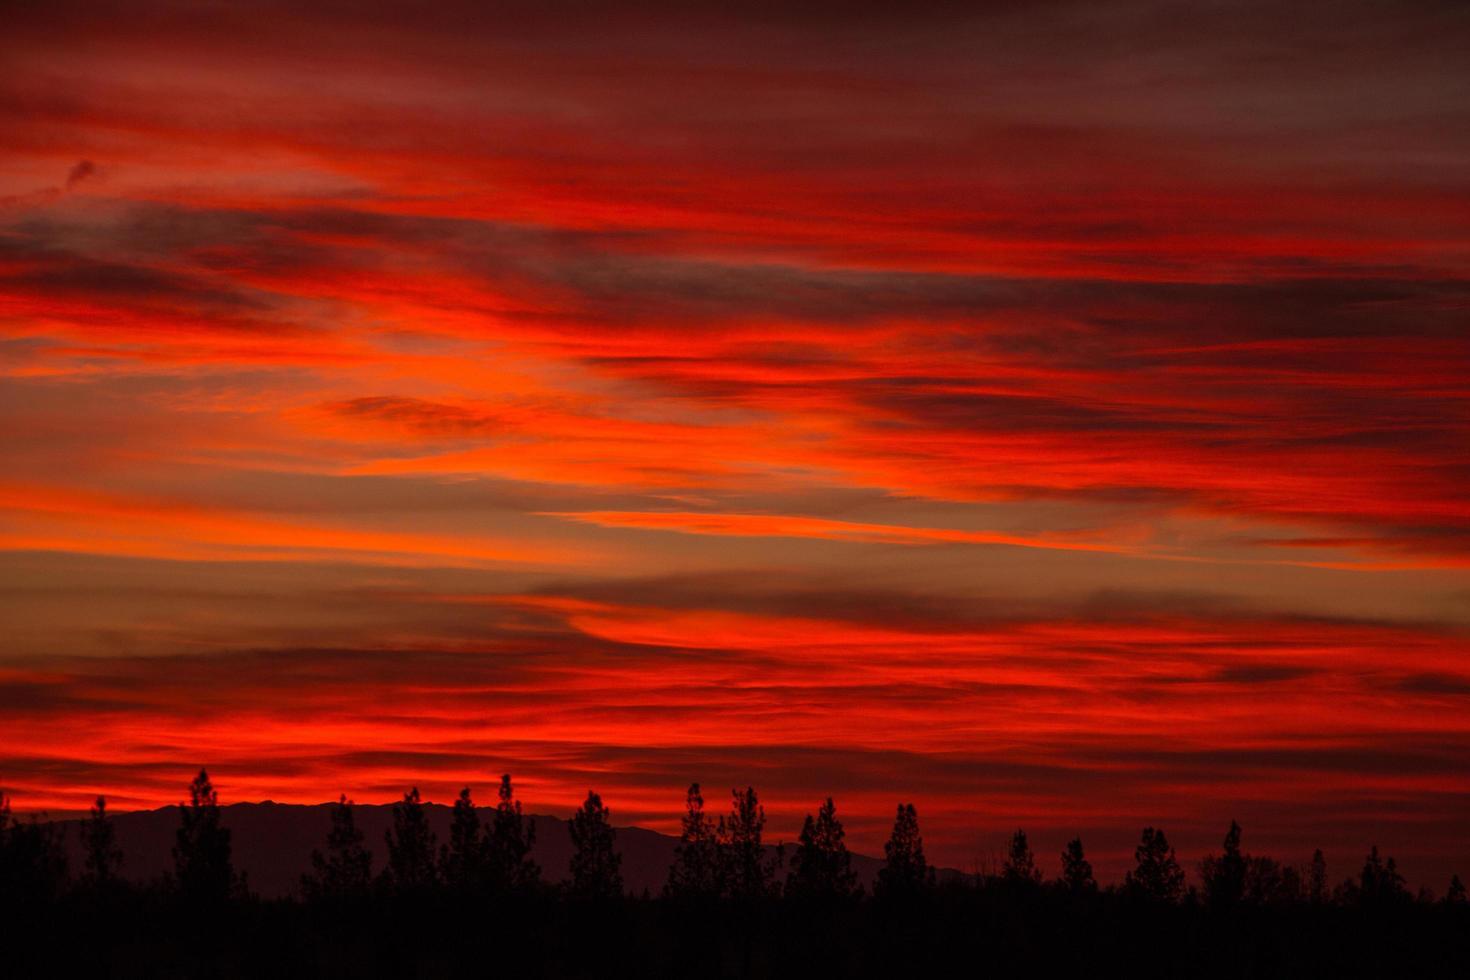 bewölkter Himmel bei Sonnenuntergang foto